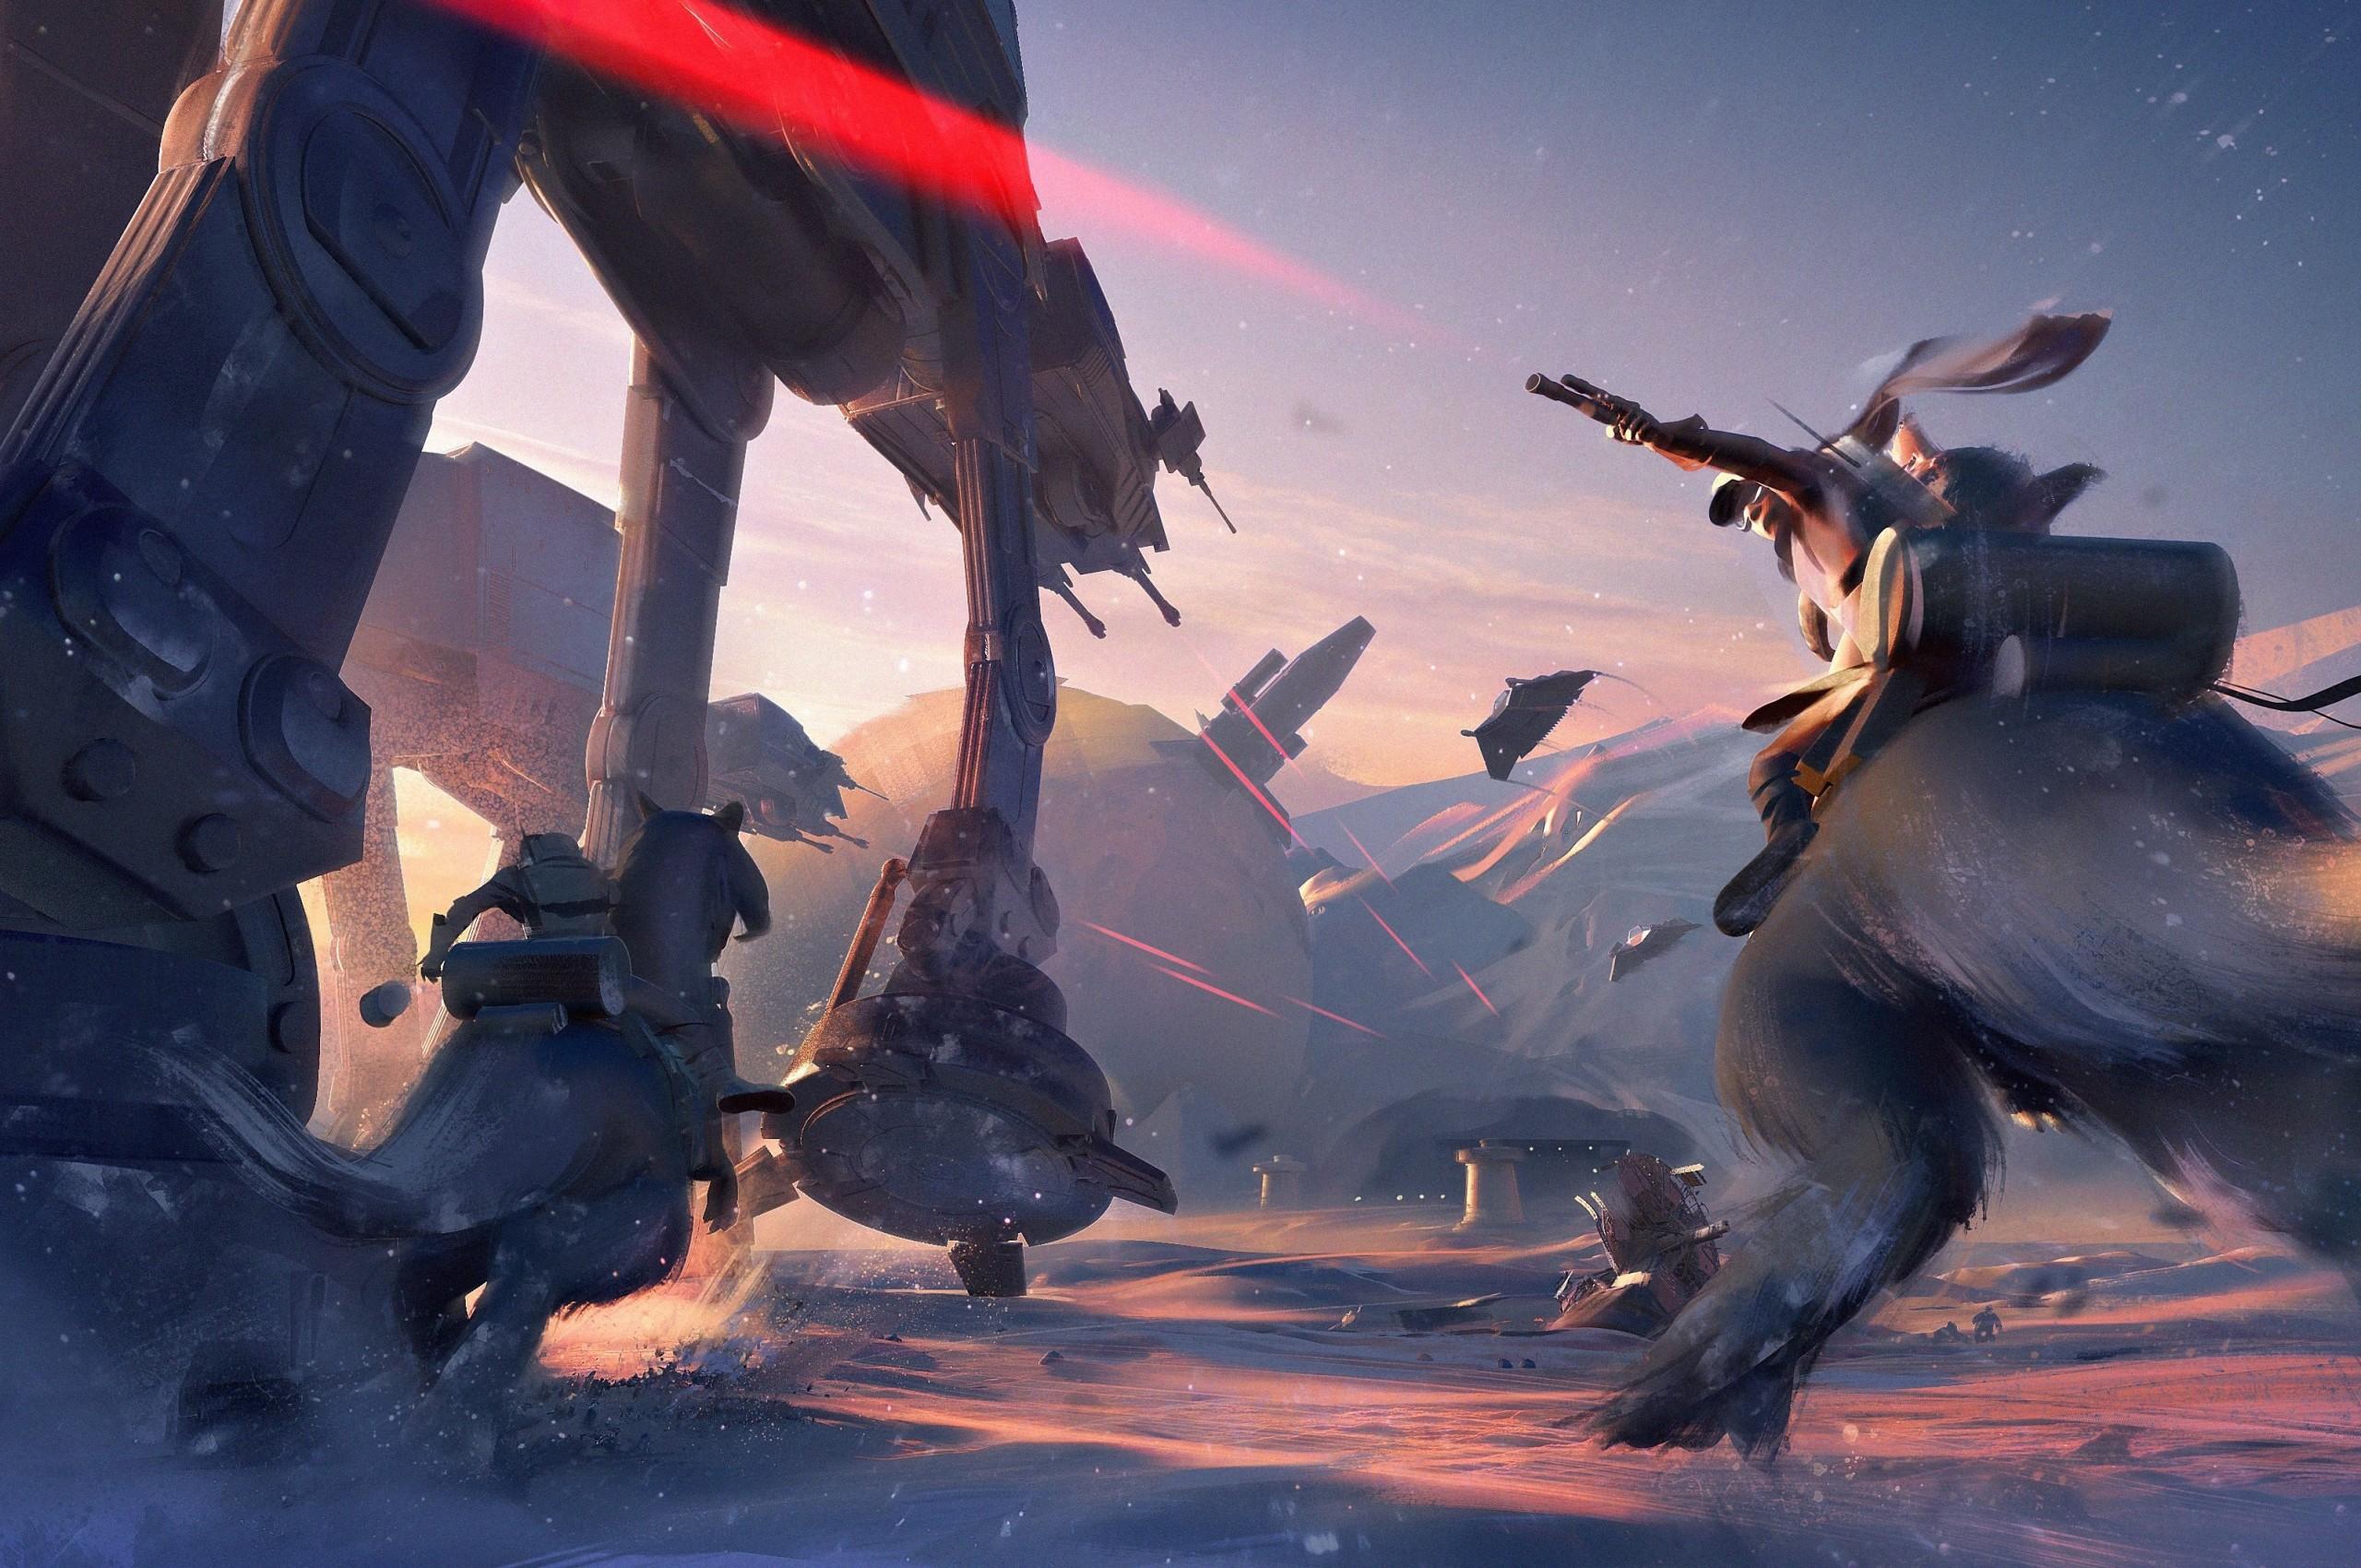 Star Wars Battlefront 2 Ea Hoth 2560x1700 Wallpaper Teahub Io